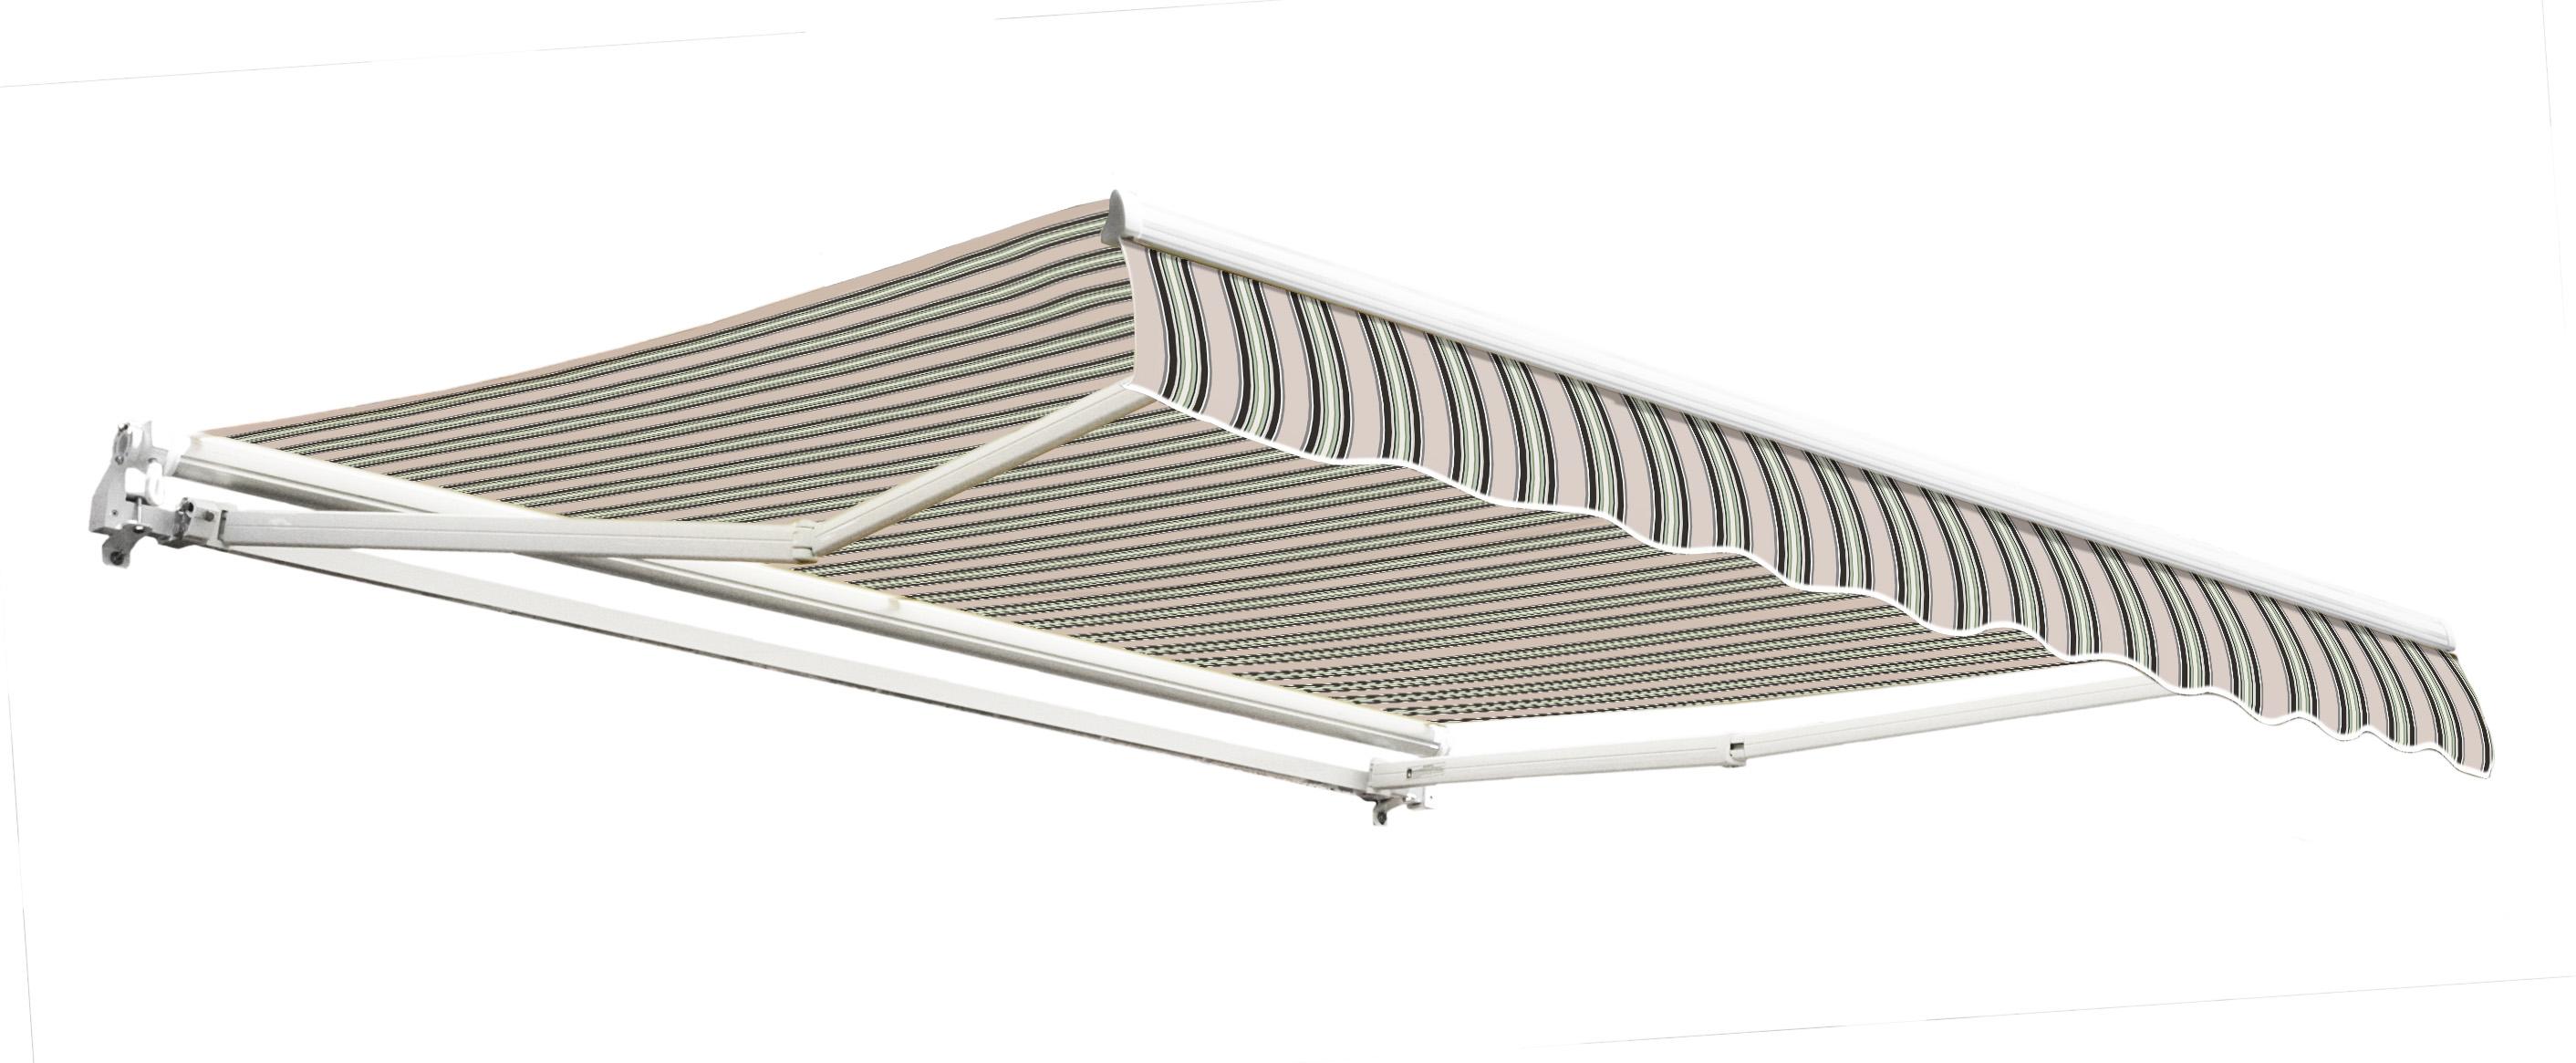 store banne budget manuel multi rayures 4m x 3m. Black Bedroom Furniture Sets. Home Design Ideas